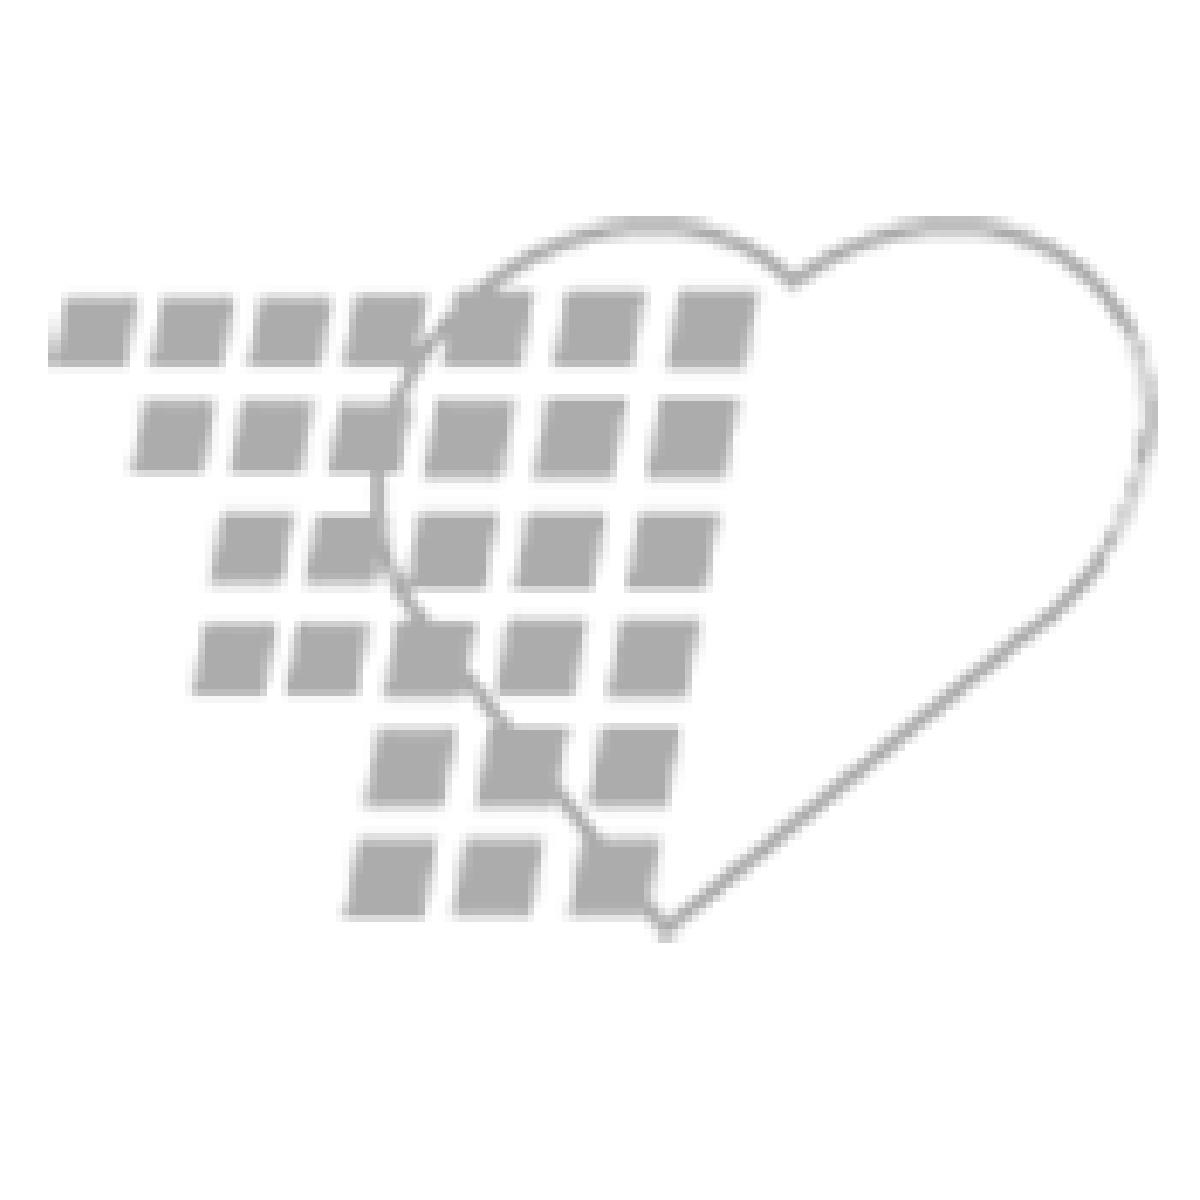 06-93-1704 Demo Dose® Capsule Gel Red Medium Oval - 1000 Pills/Jar